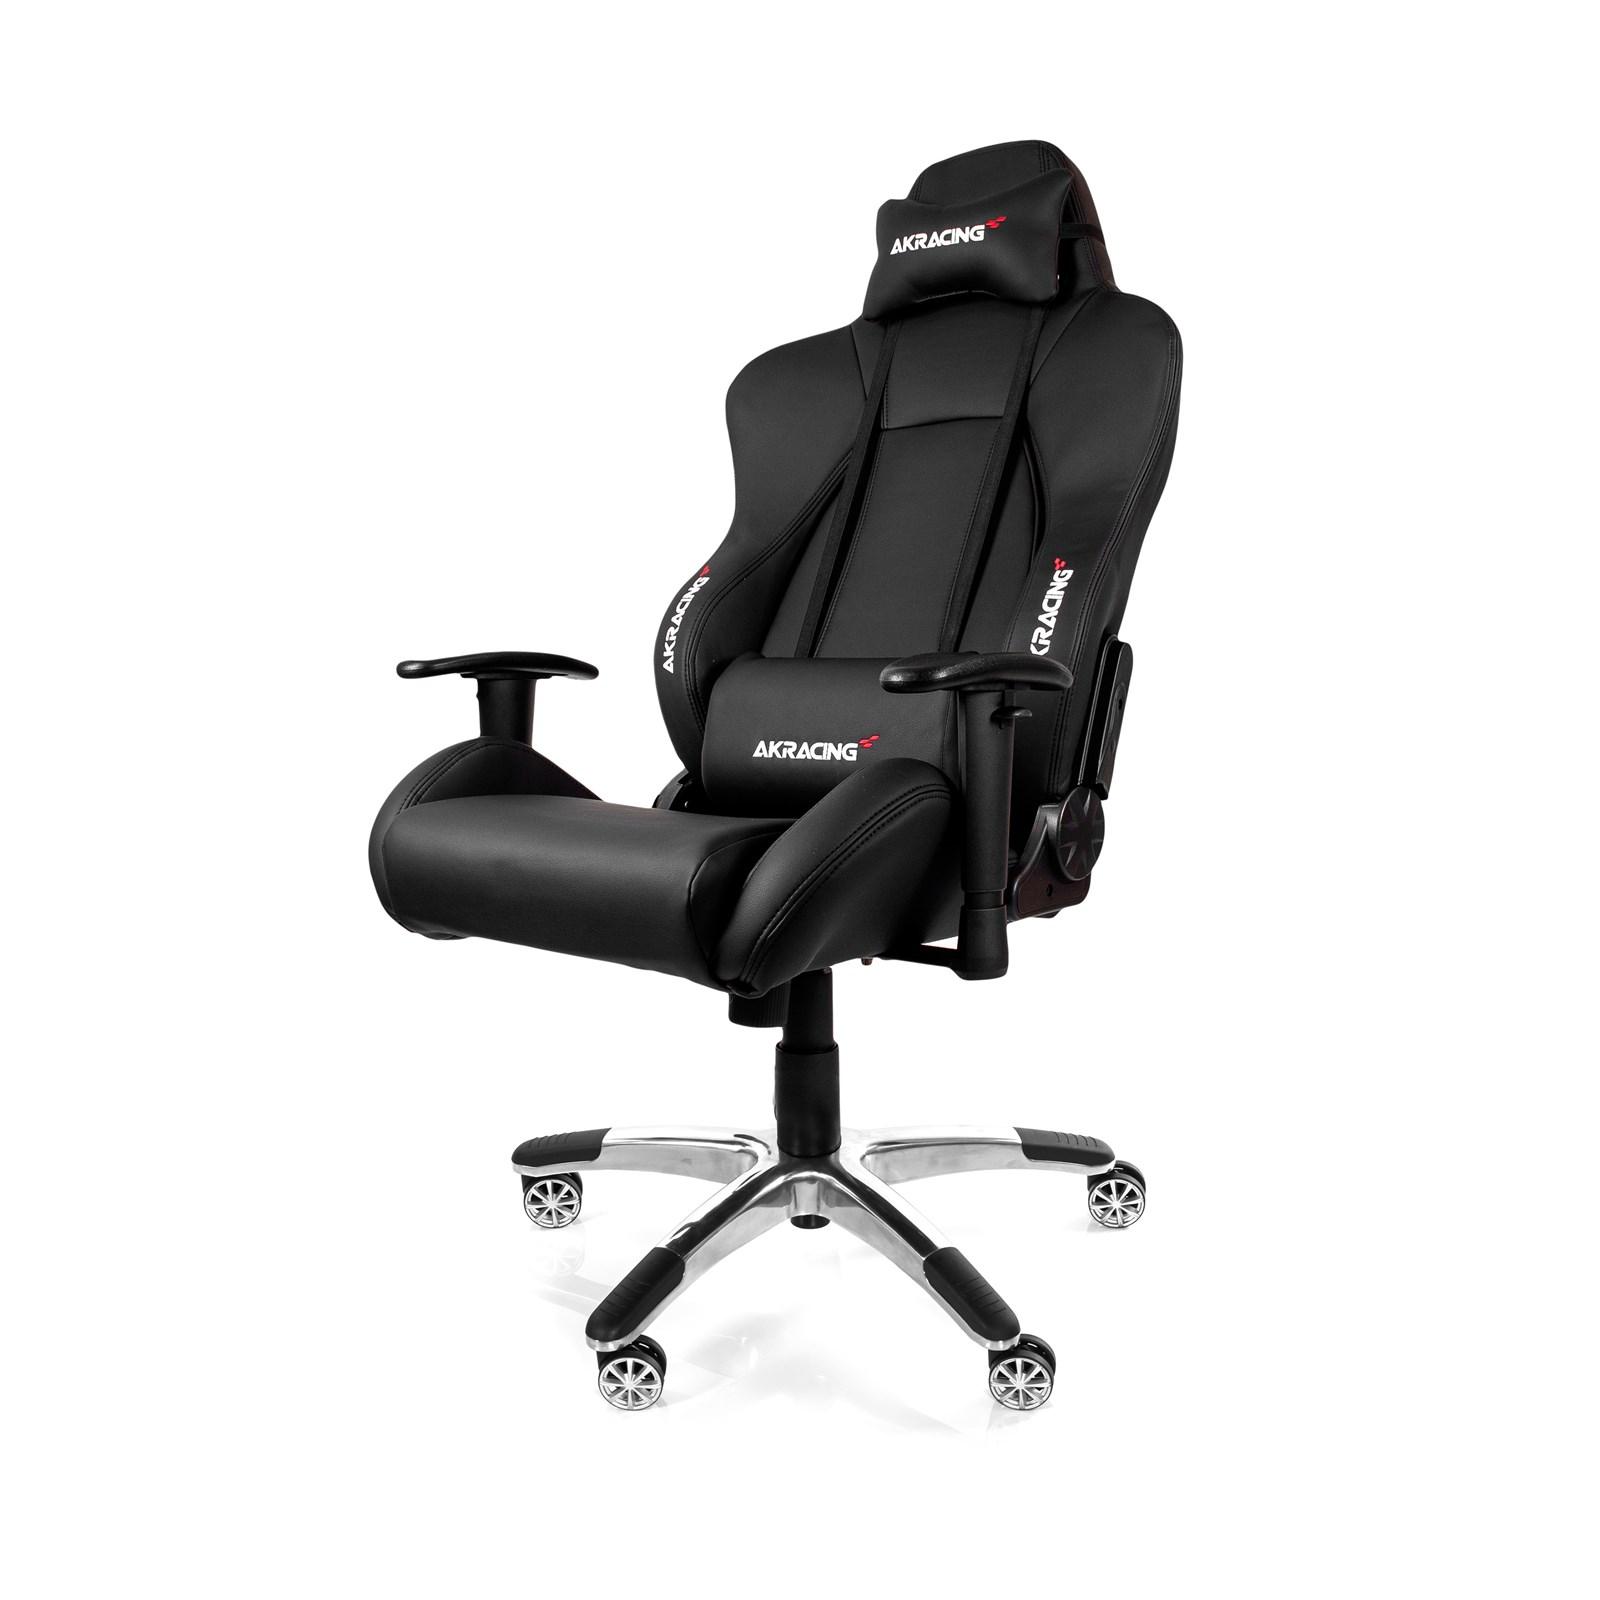 AK Racing Premium V2 Gaming Chair Black & Black AK